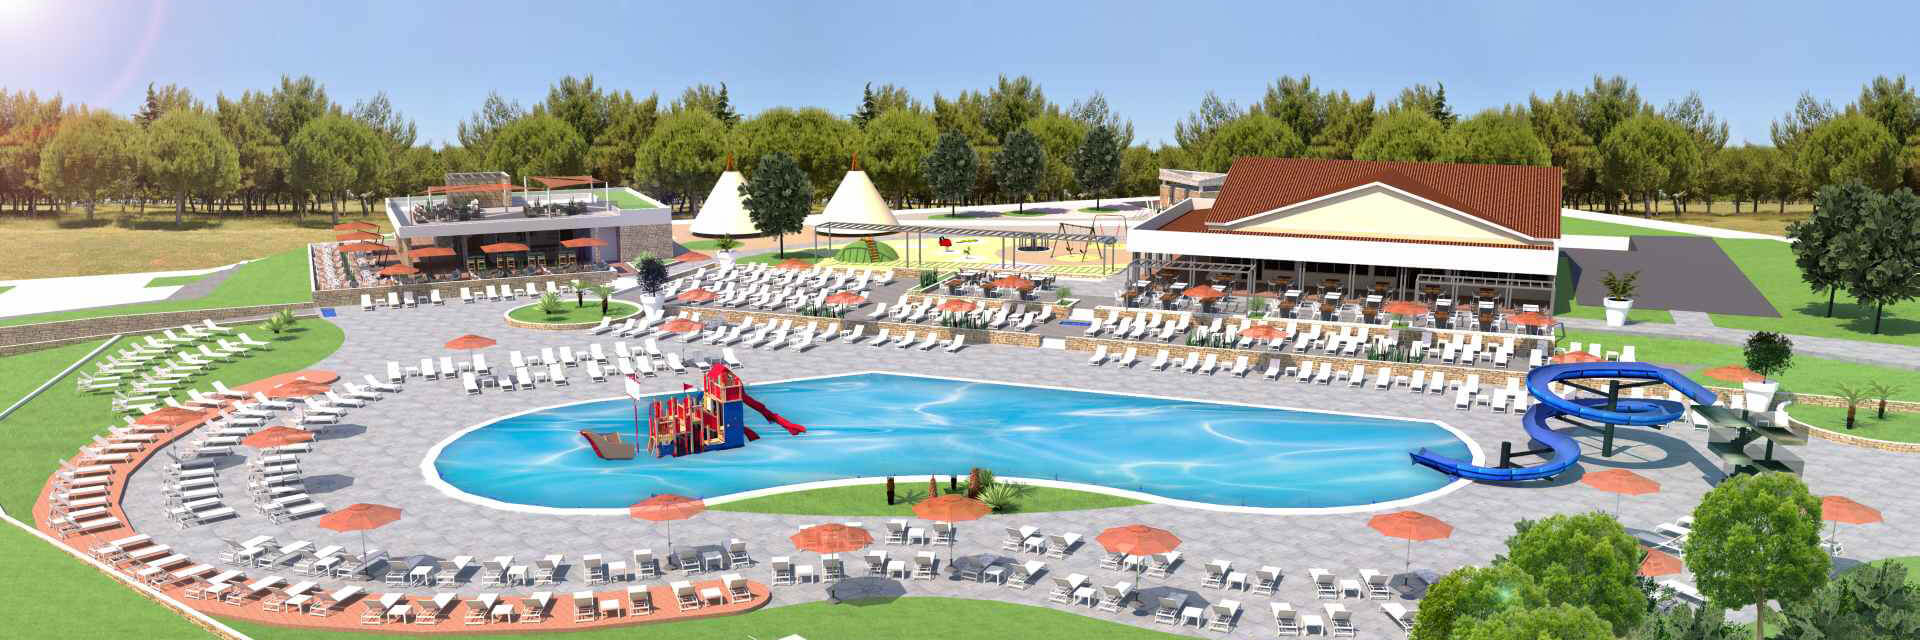 Camping-Arena-Kazela-new-pool-2019